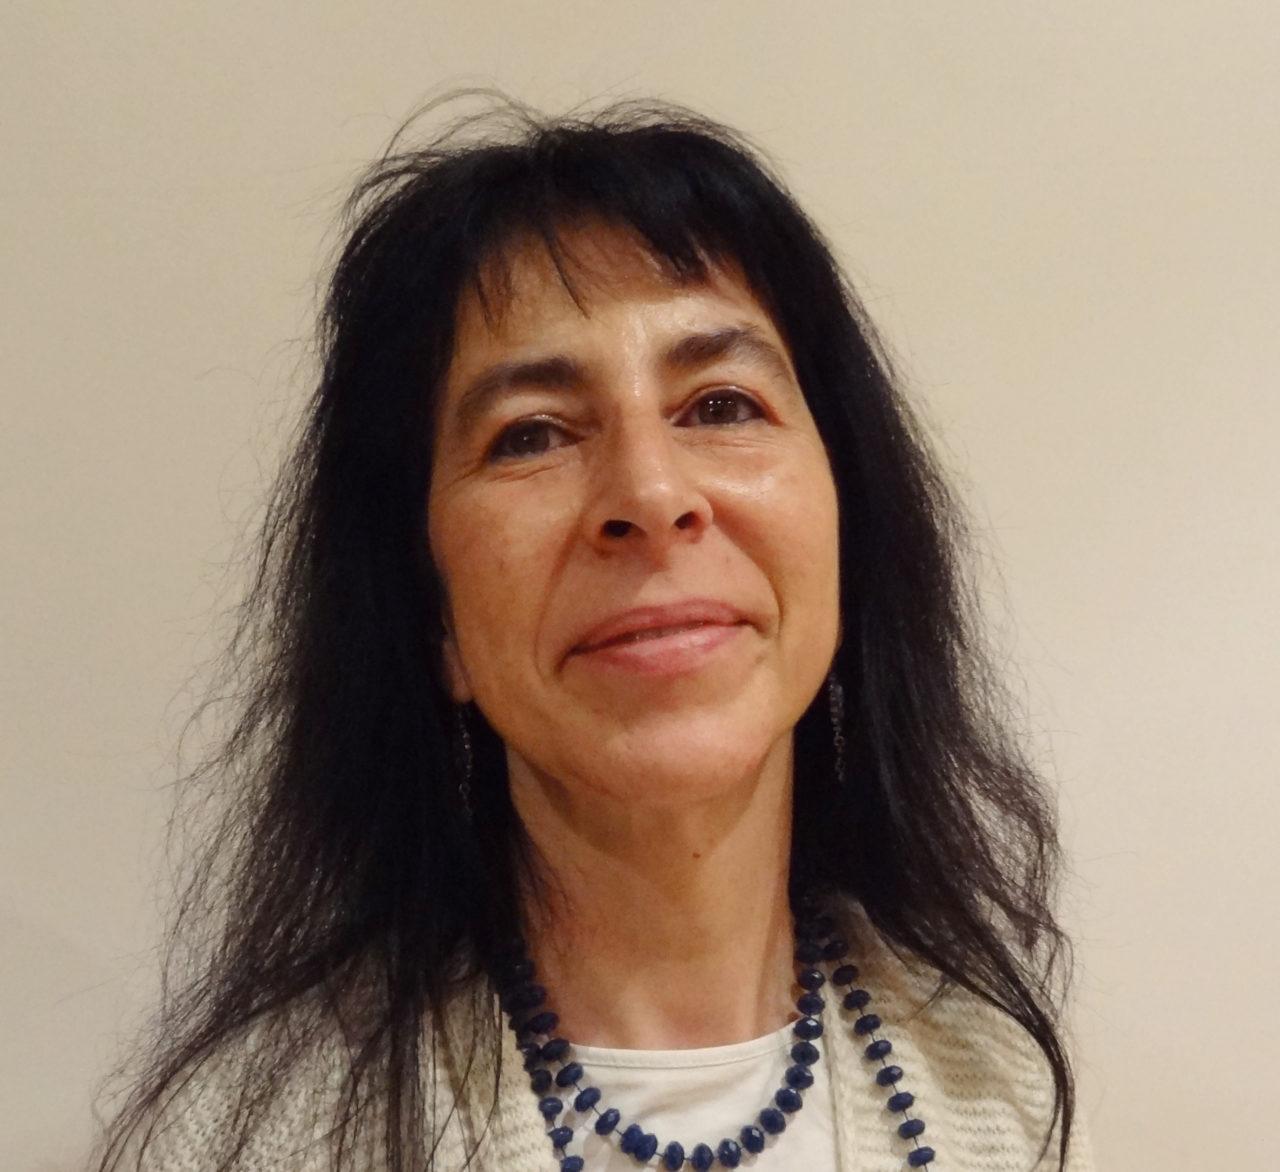 María Antonia Giménez Sánchez-Ferrer